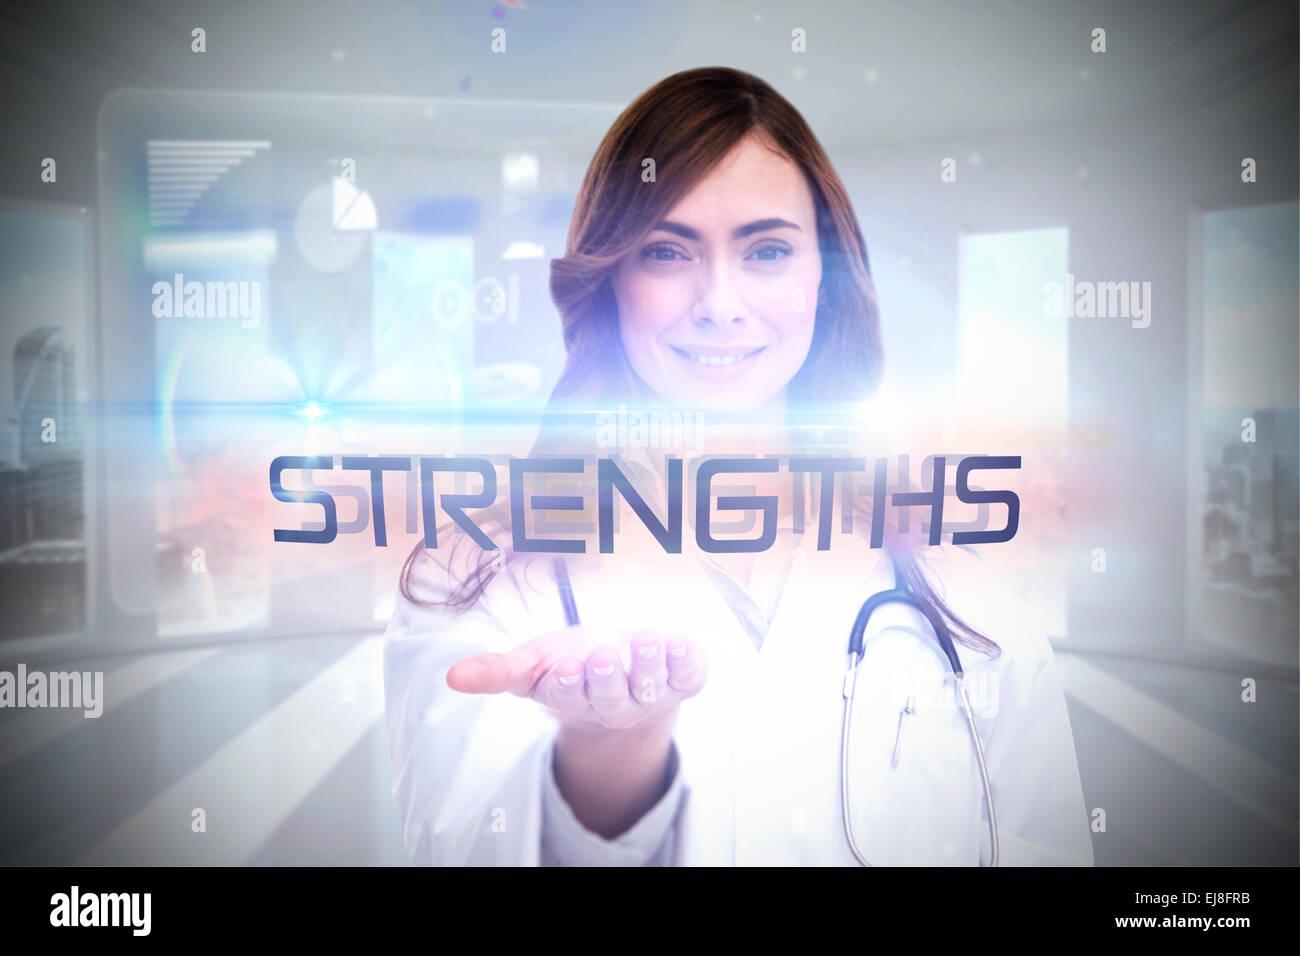 Strengths against global business hologram - Stock Image